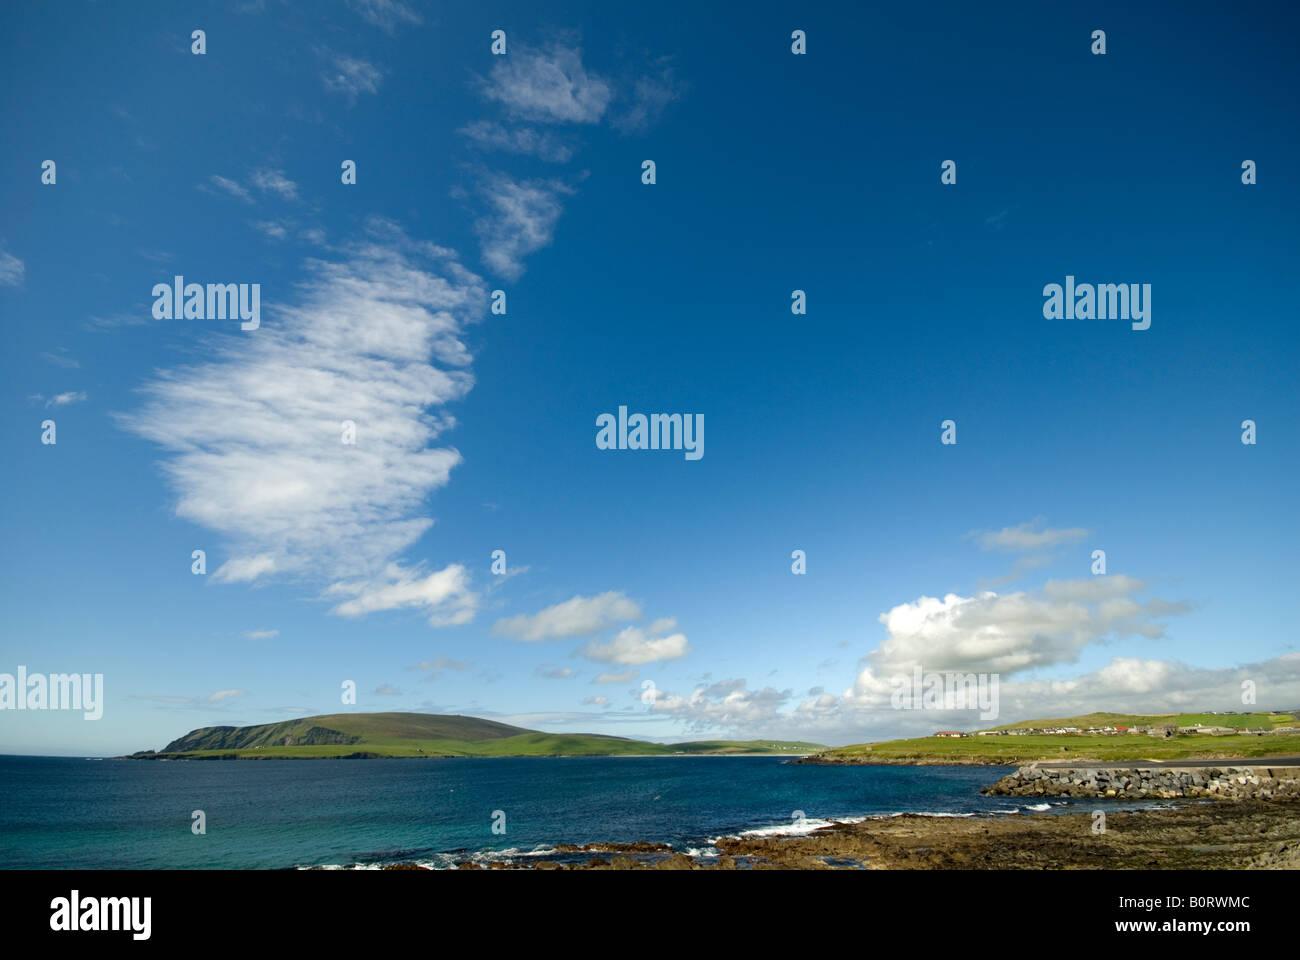 Fitful Head, near Sumburgh, Shetland Islands, Scotland, UK Stock Photo